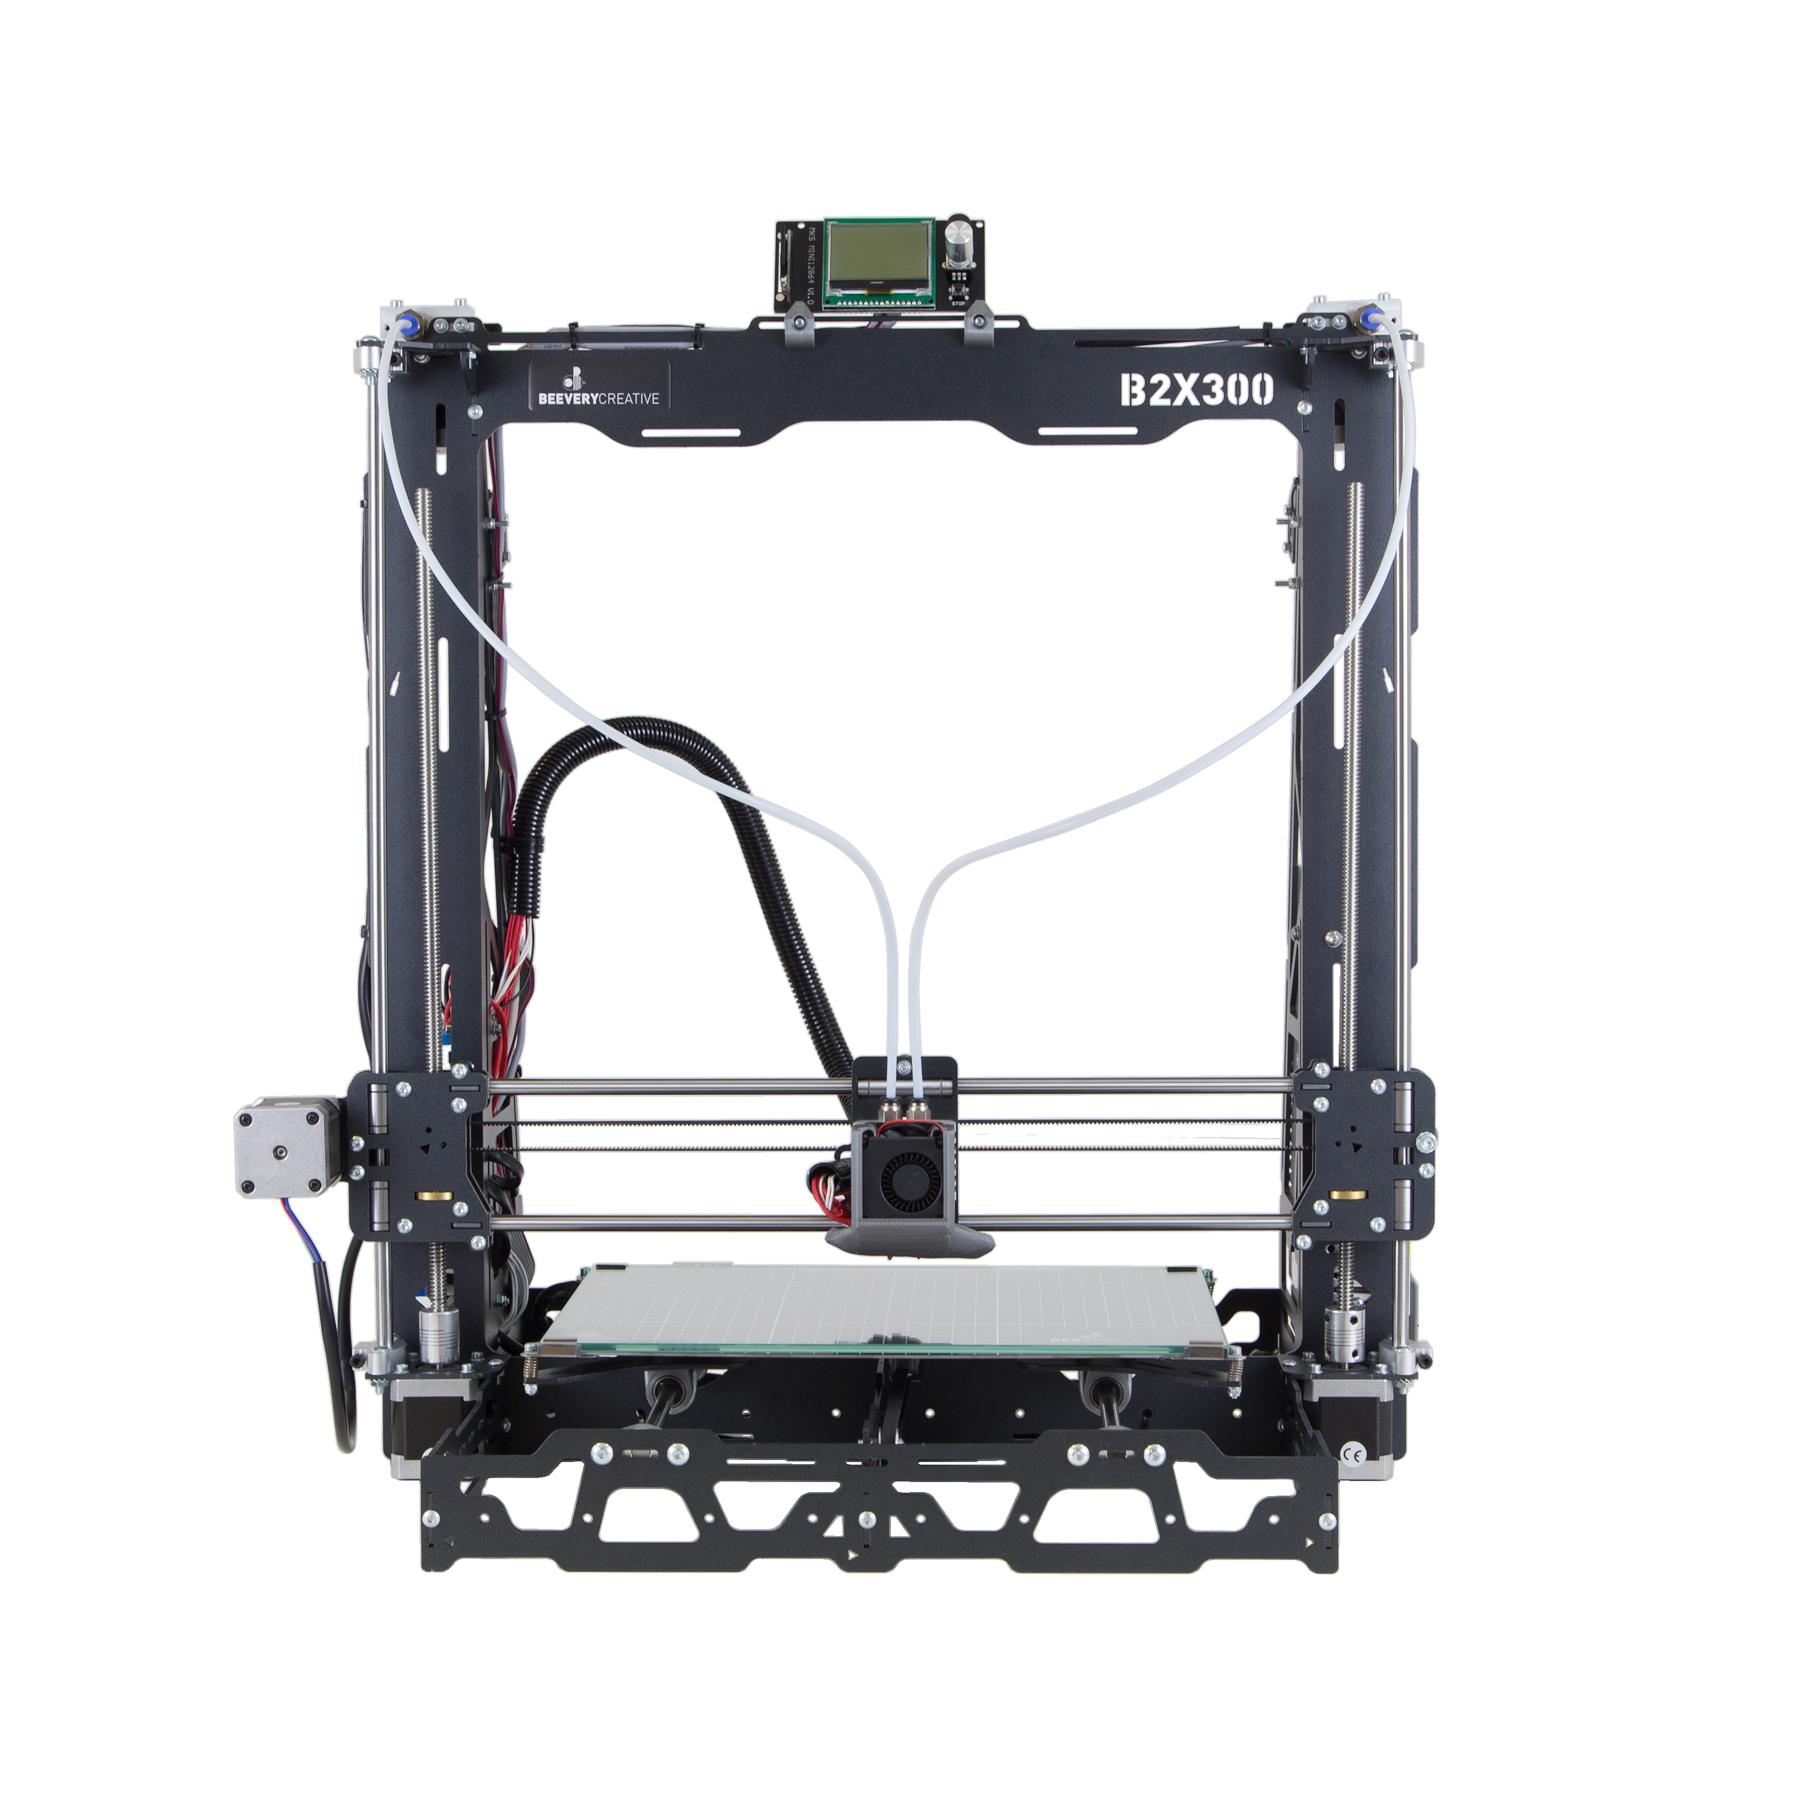 Impressora DIY B2X300 da Beeverycreative